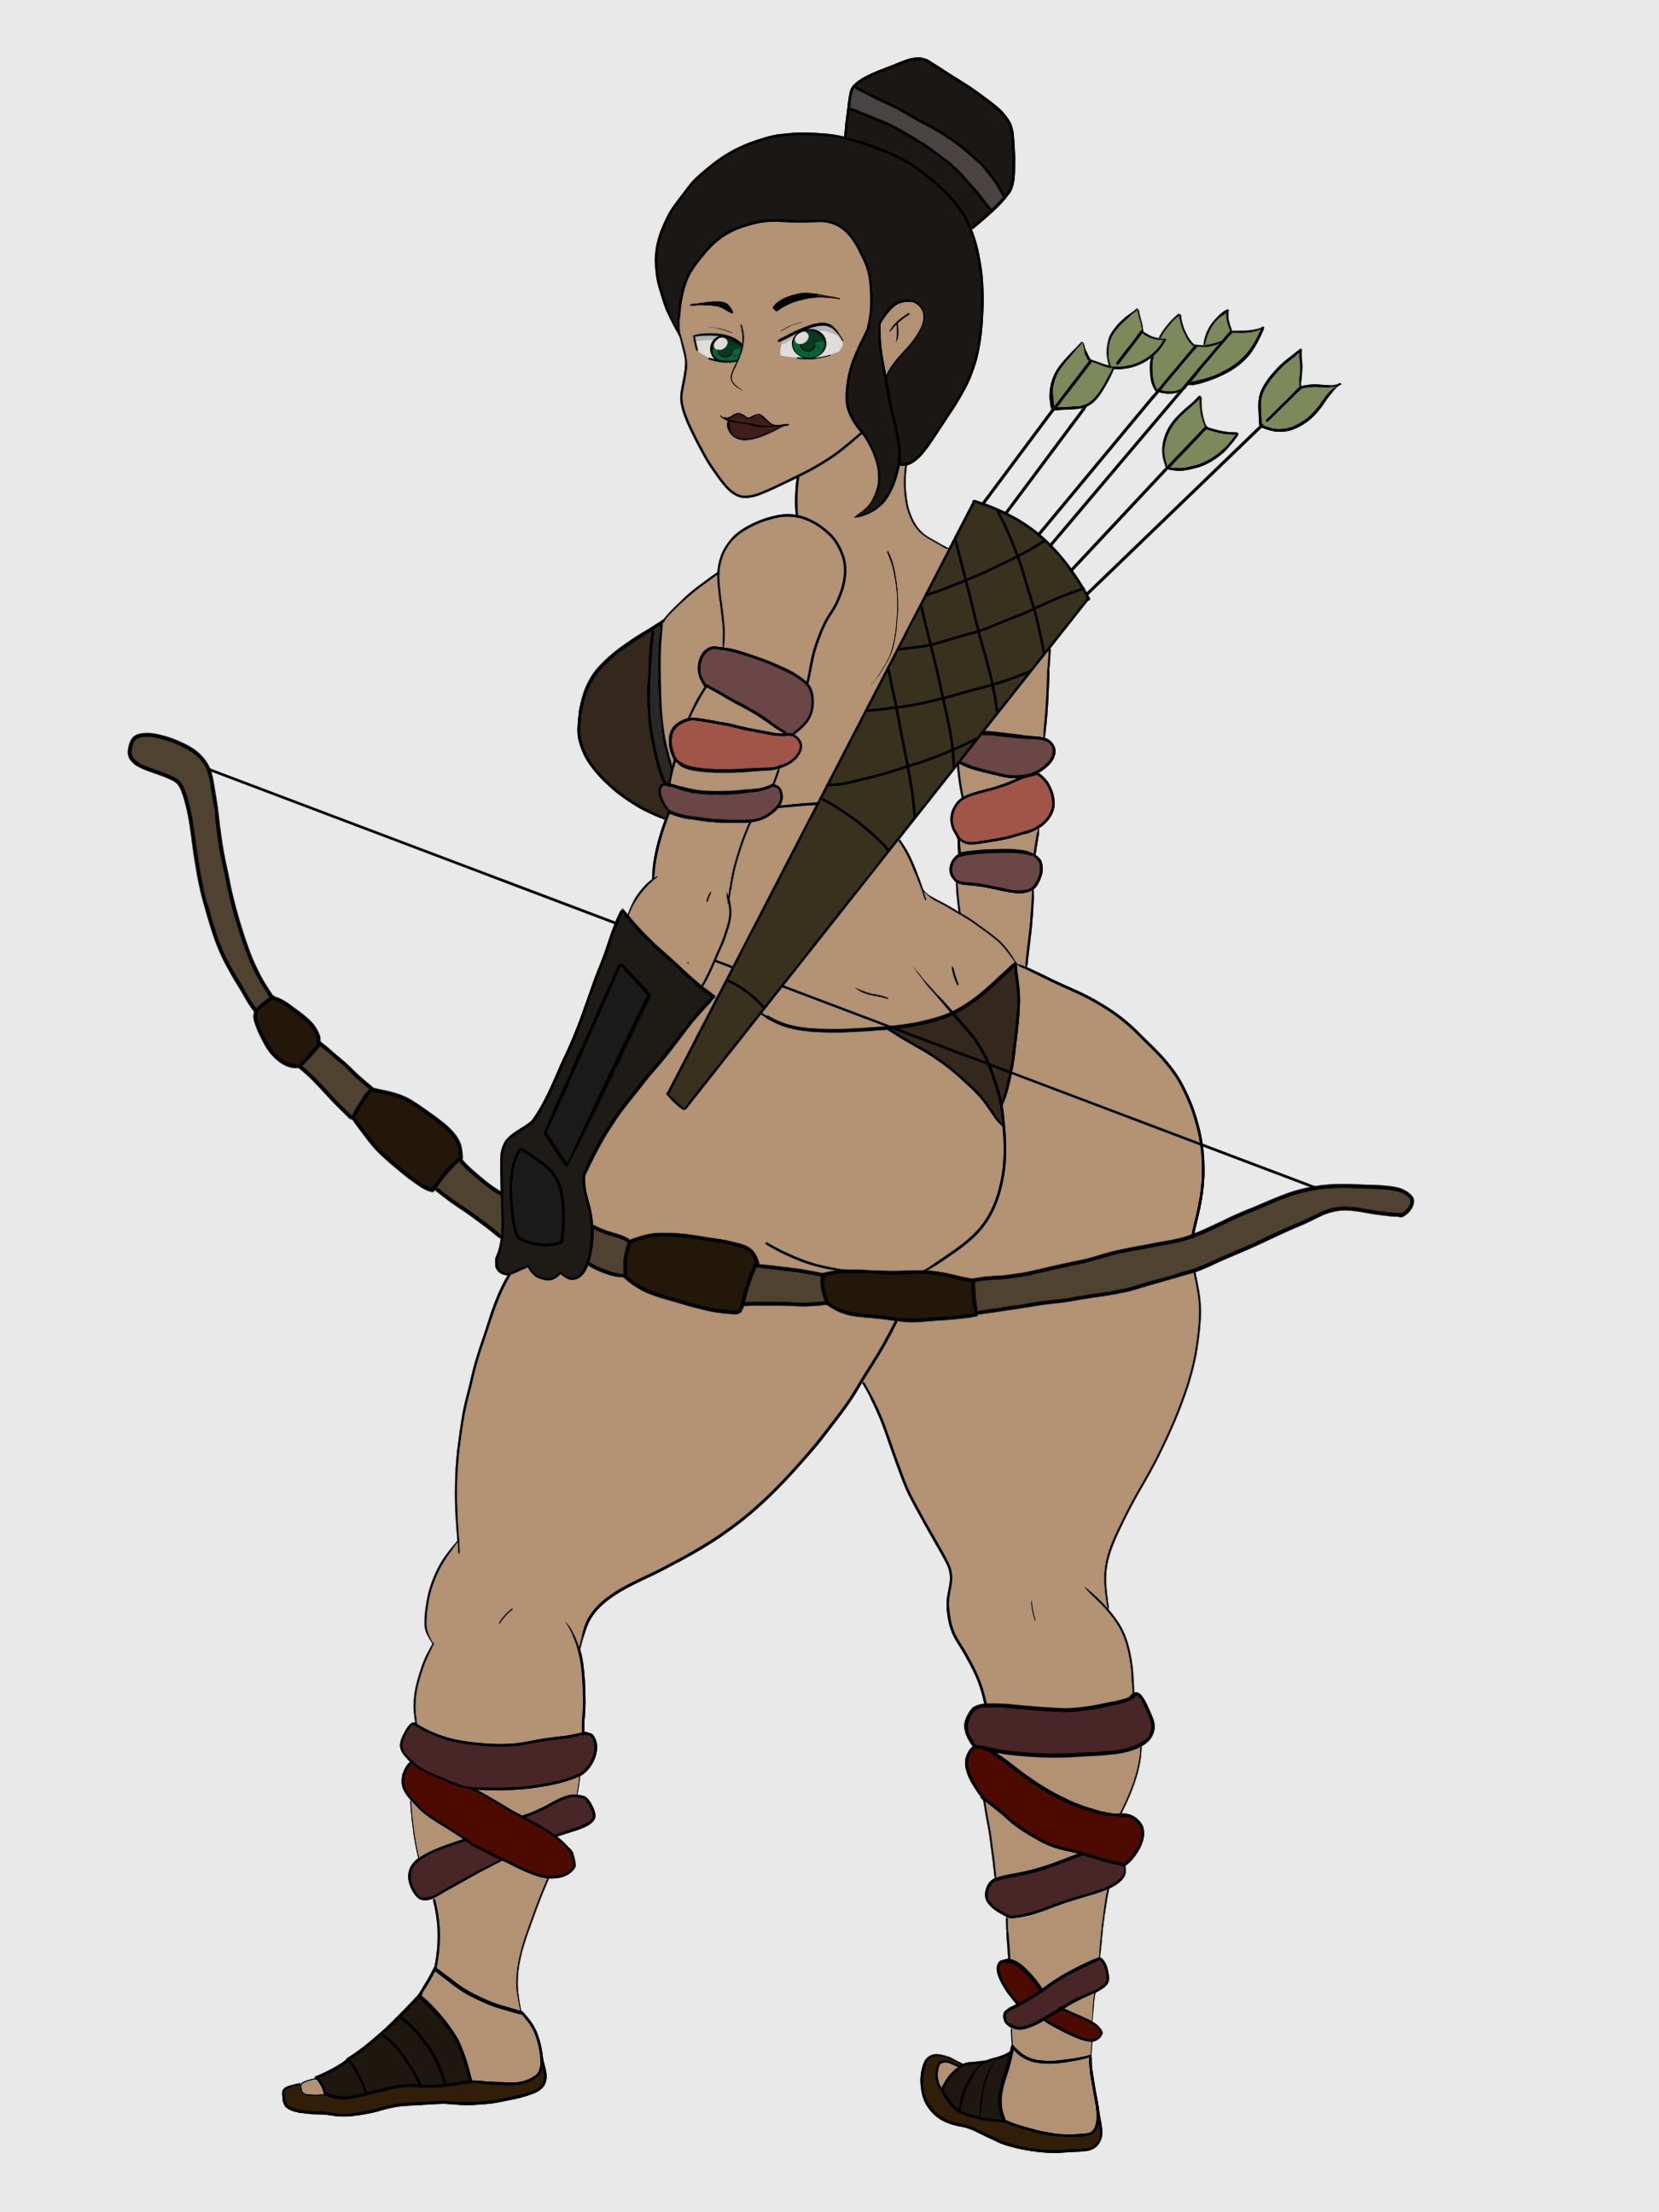 Jenny (The Warrior) by Flavio170